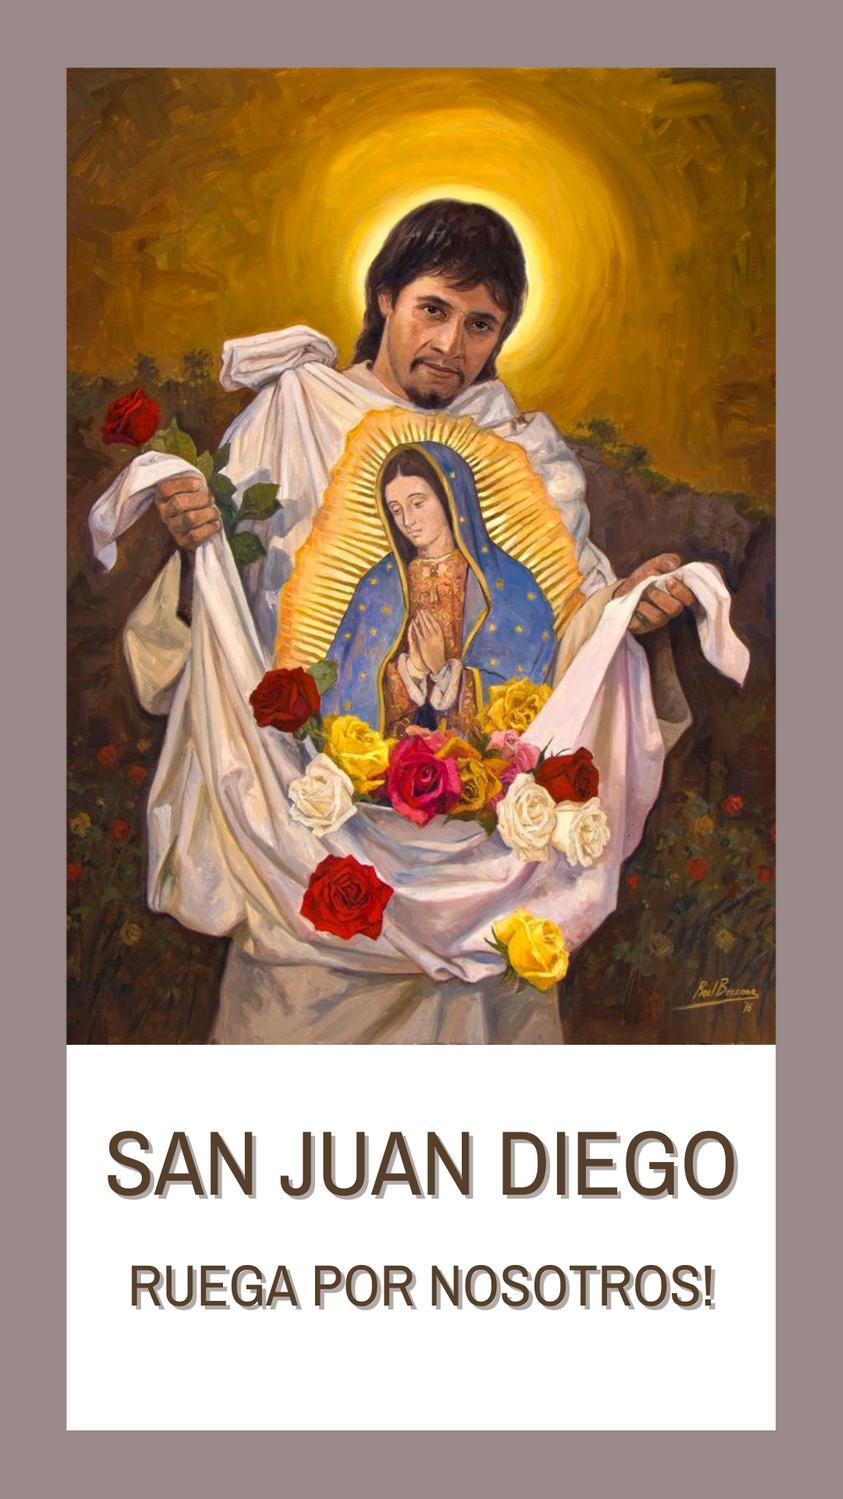 San Juan Diego Catholic Priest Catholic Images San Juan